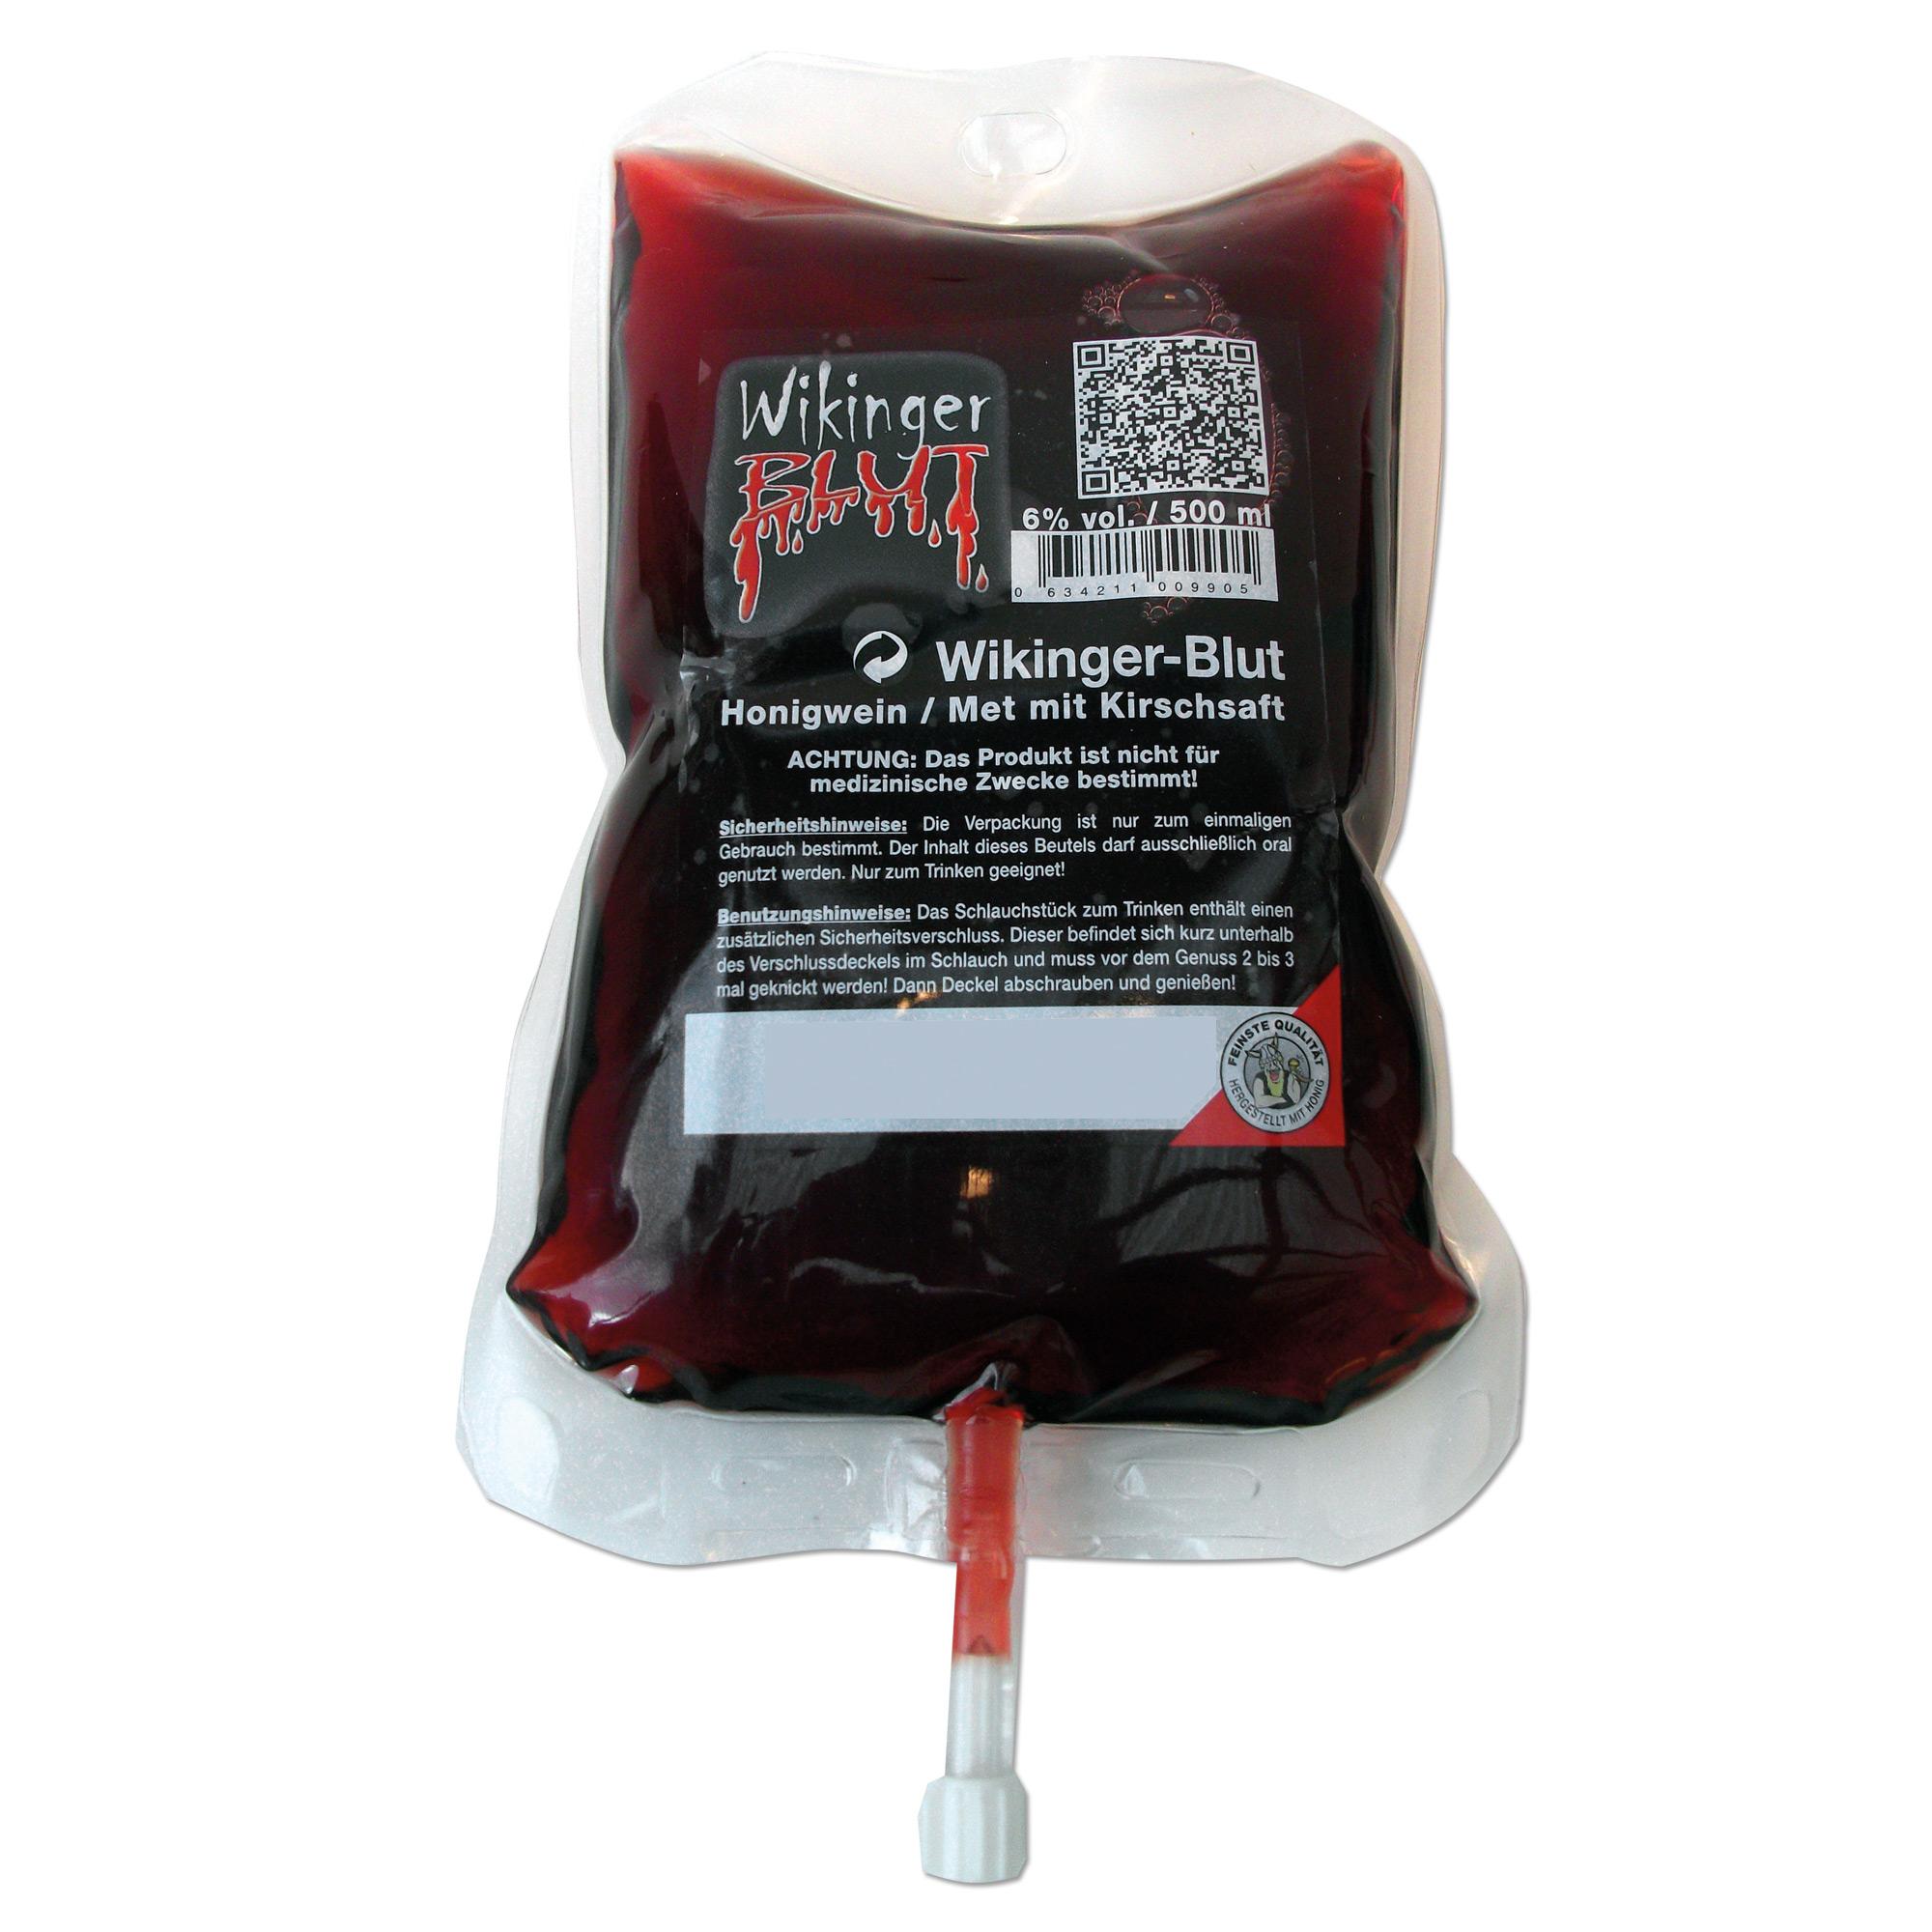 Trinkbeutel Wikinger Blut 0.5 l